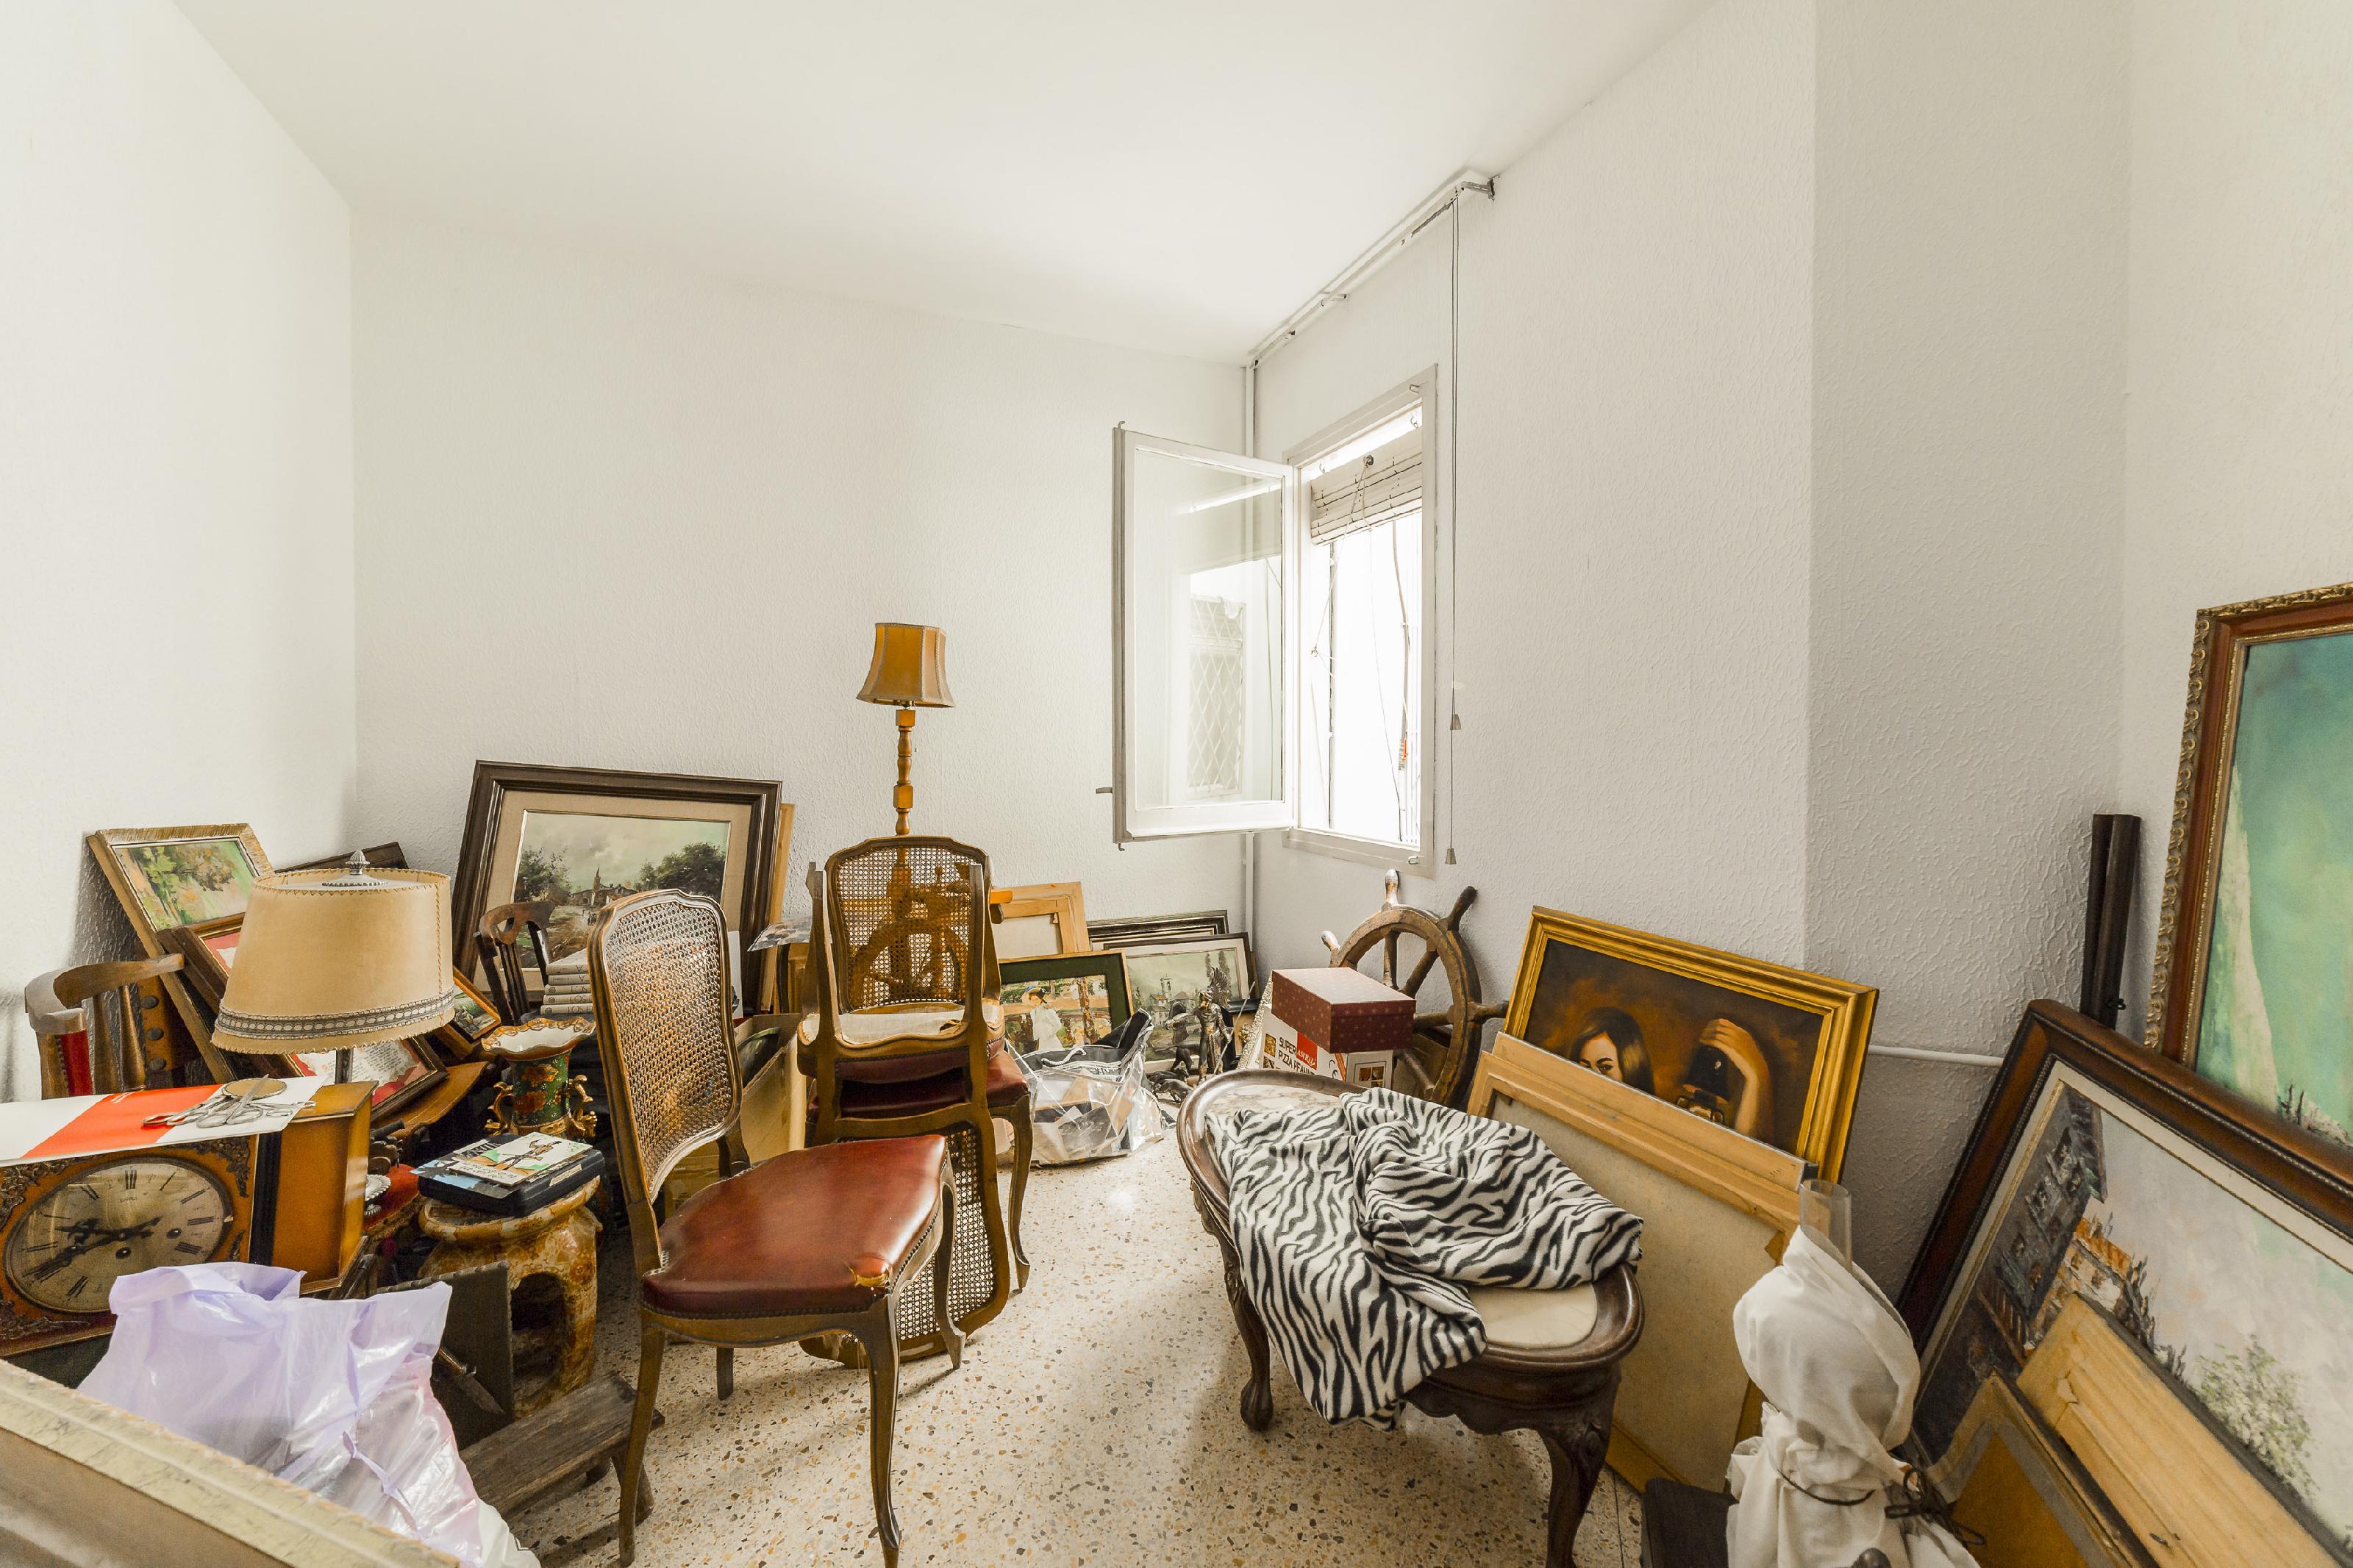 247624 Flat for sale in Eixample, Sant Antoni 22